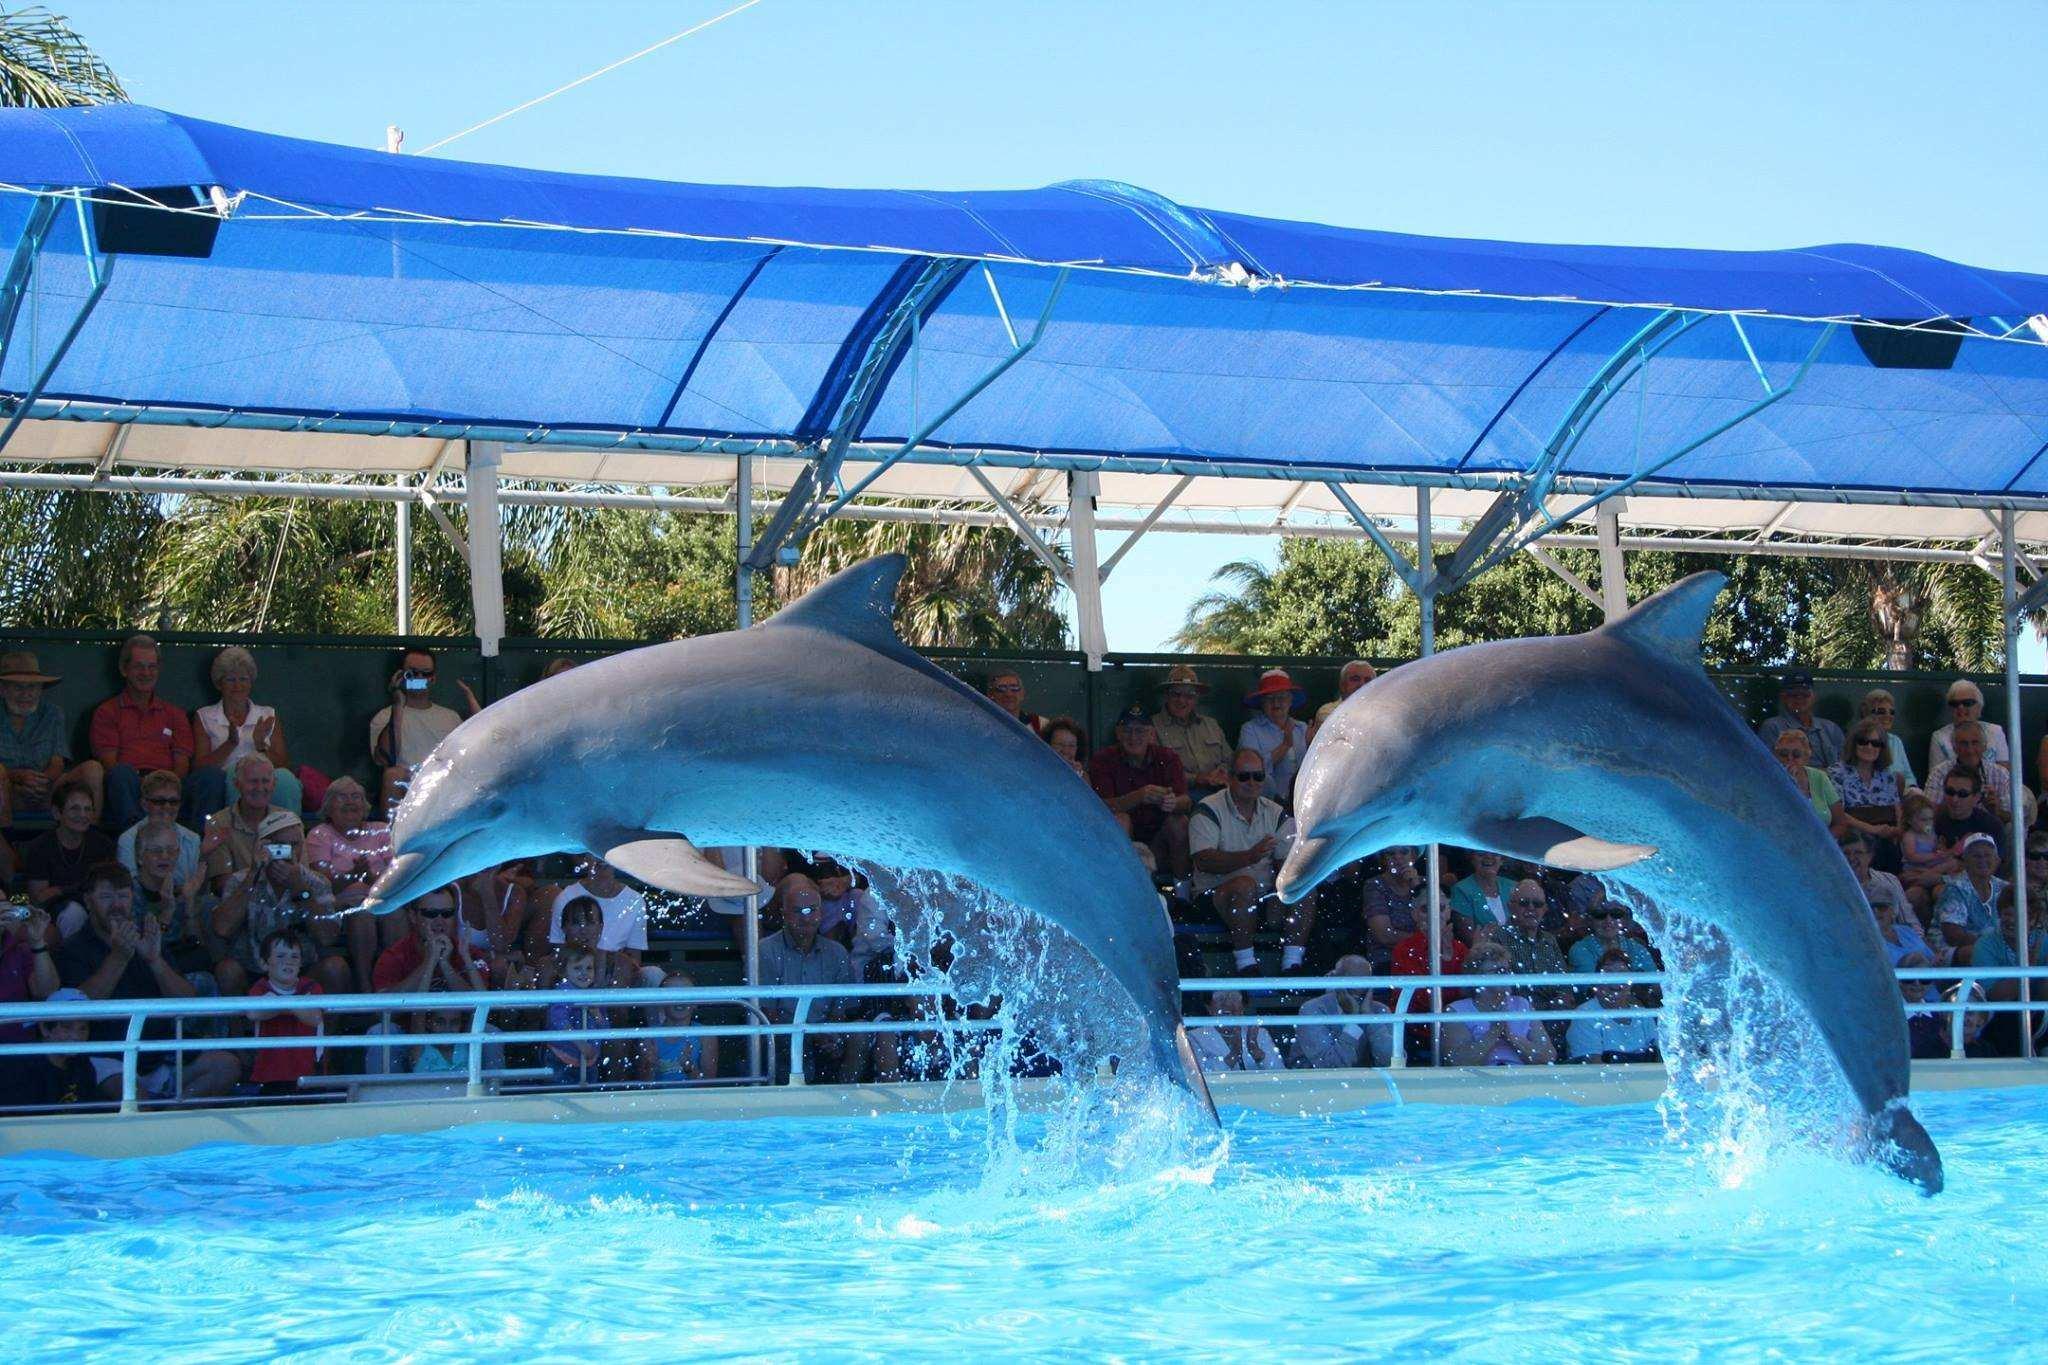 ВПриморском океанариуме умер третий дельфин-белобочка